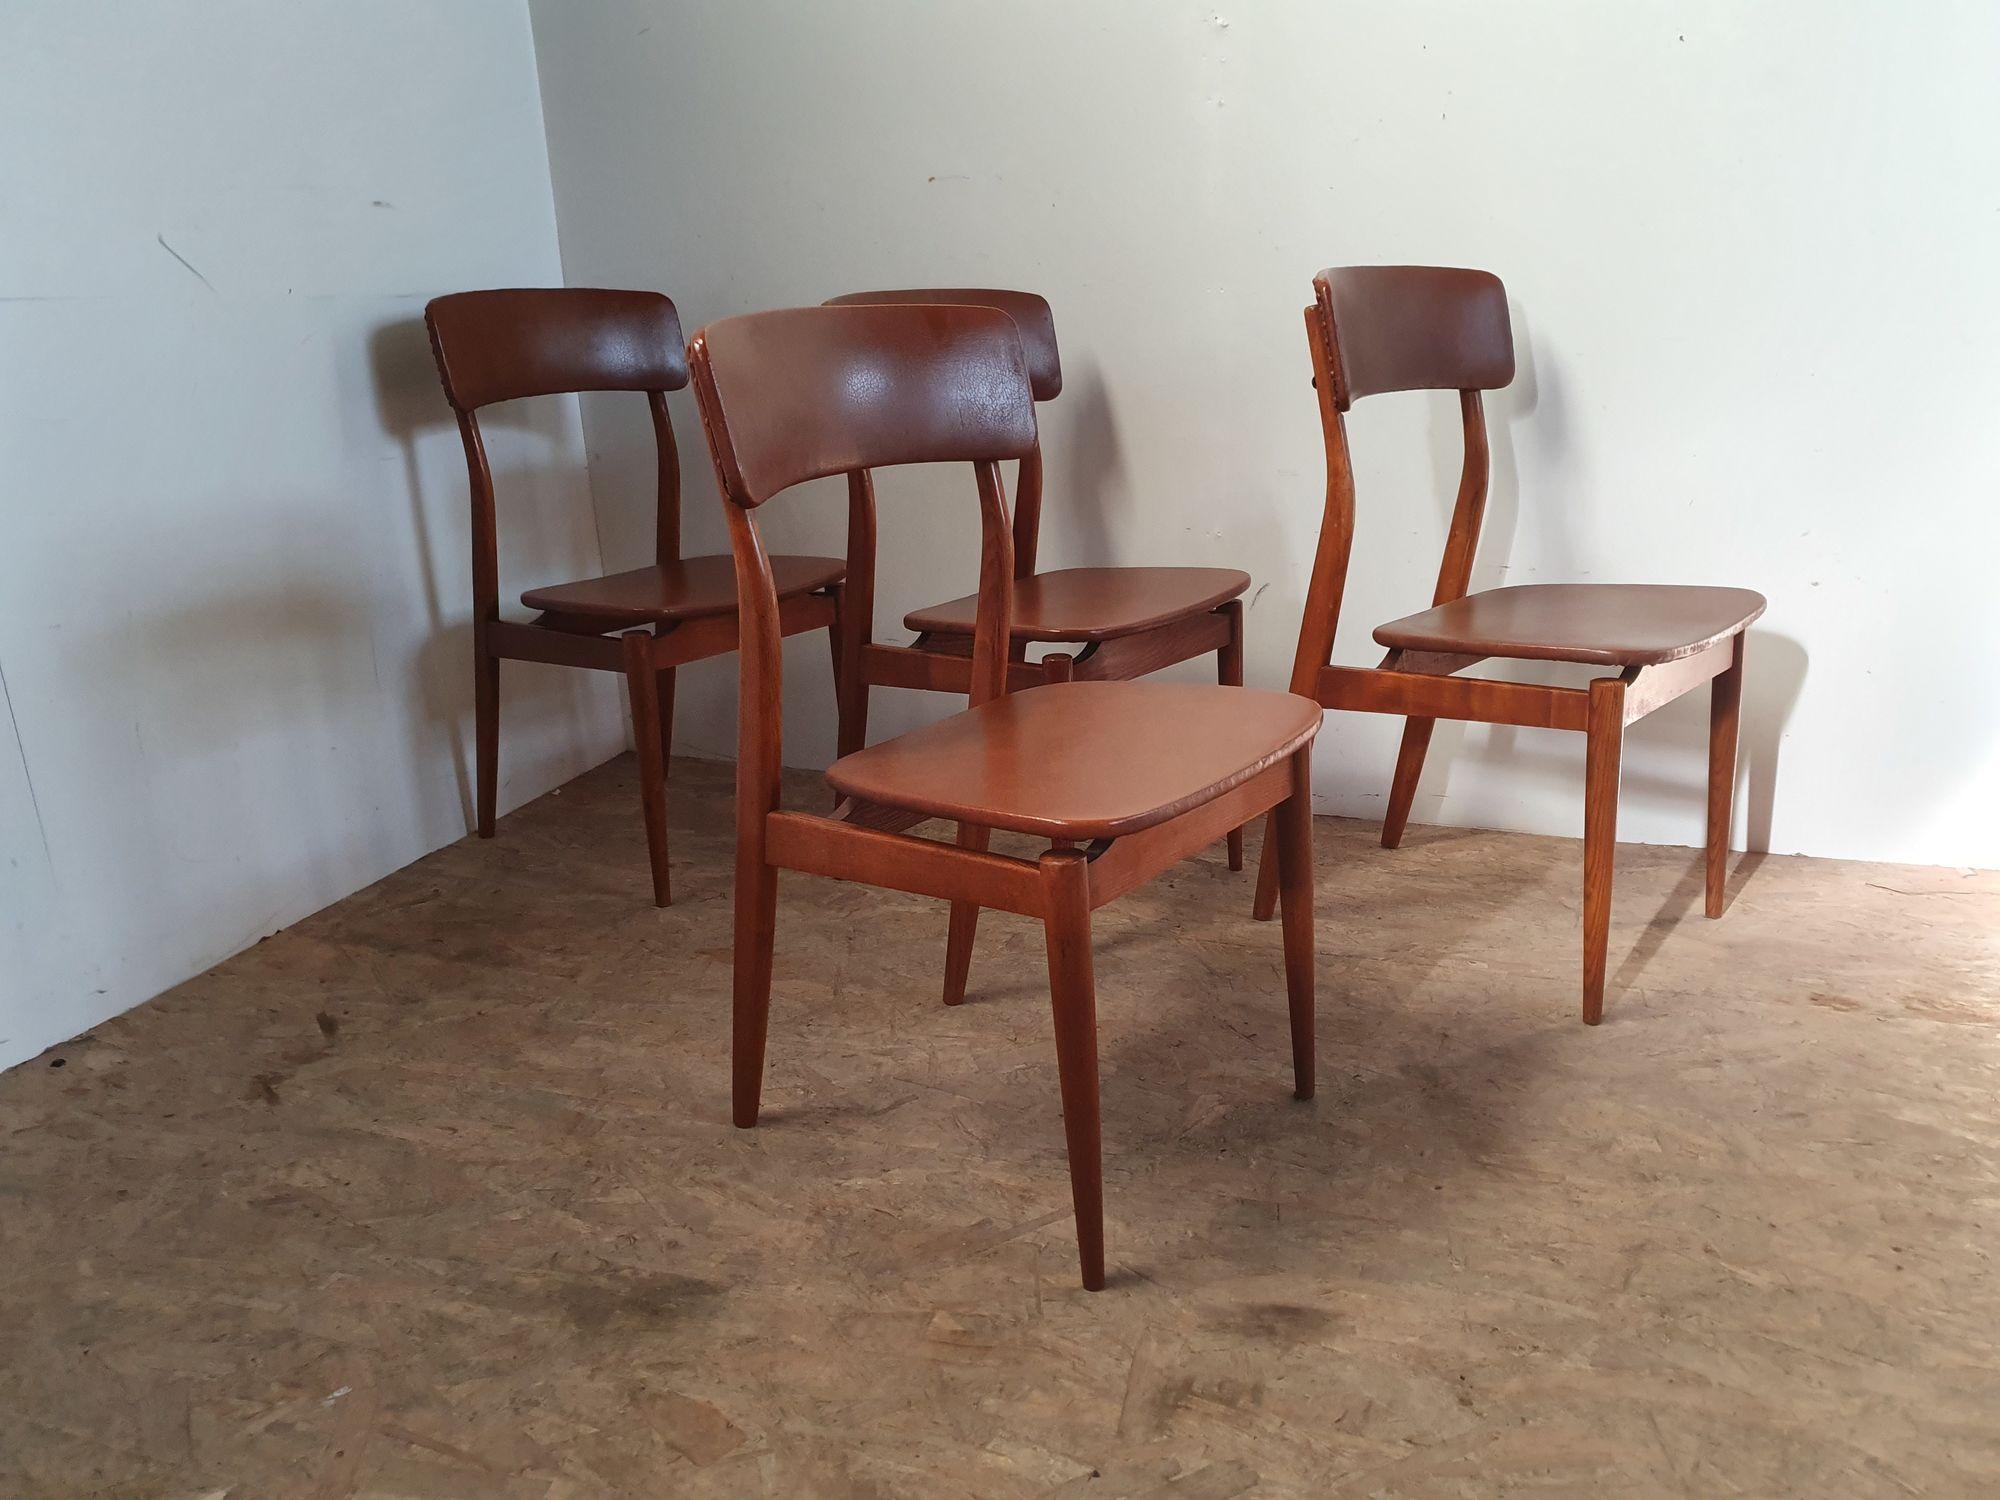 4 vintage stoelen